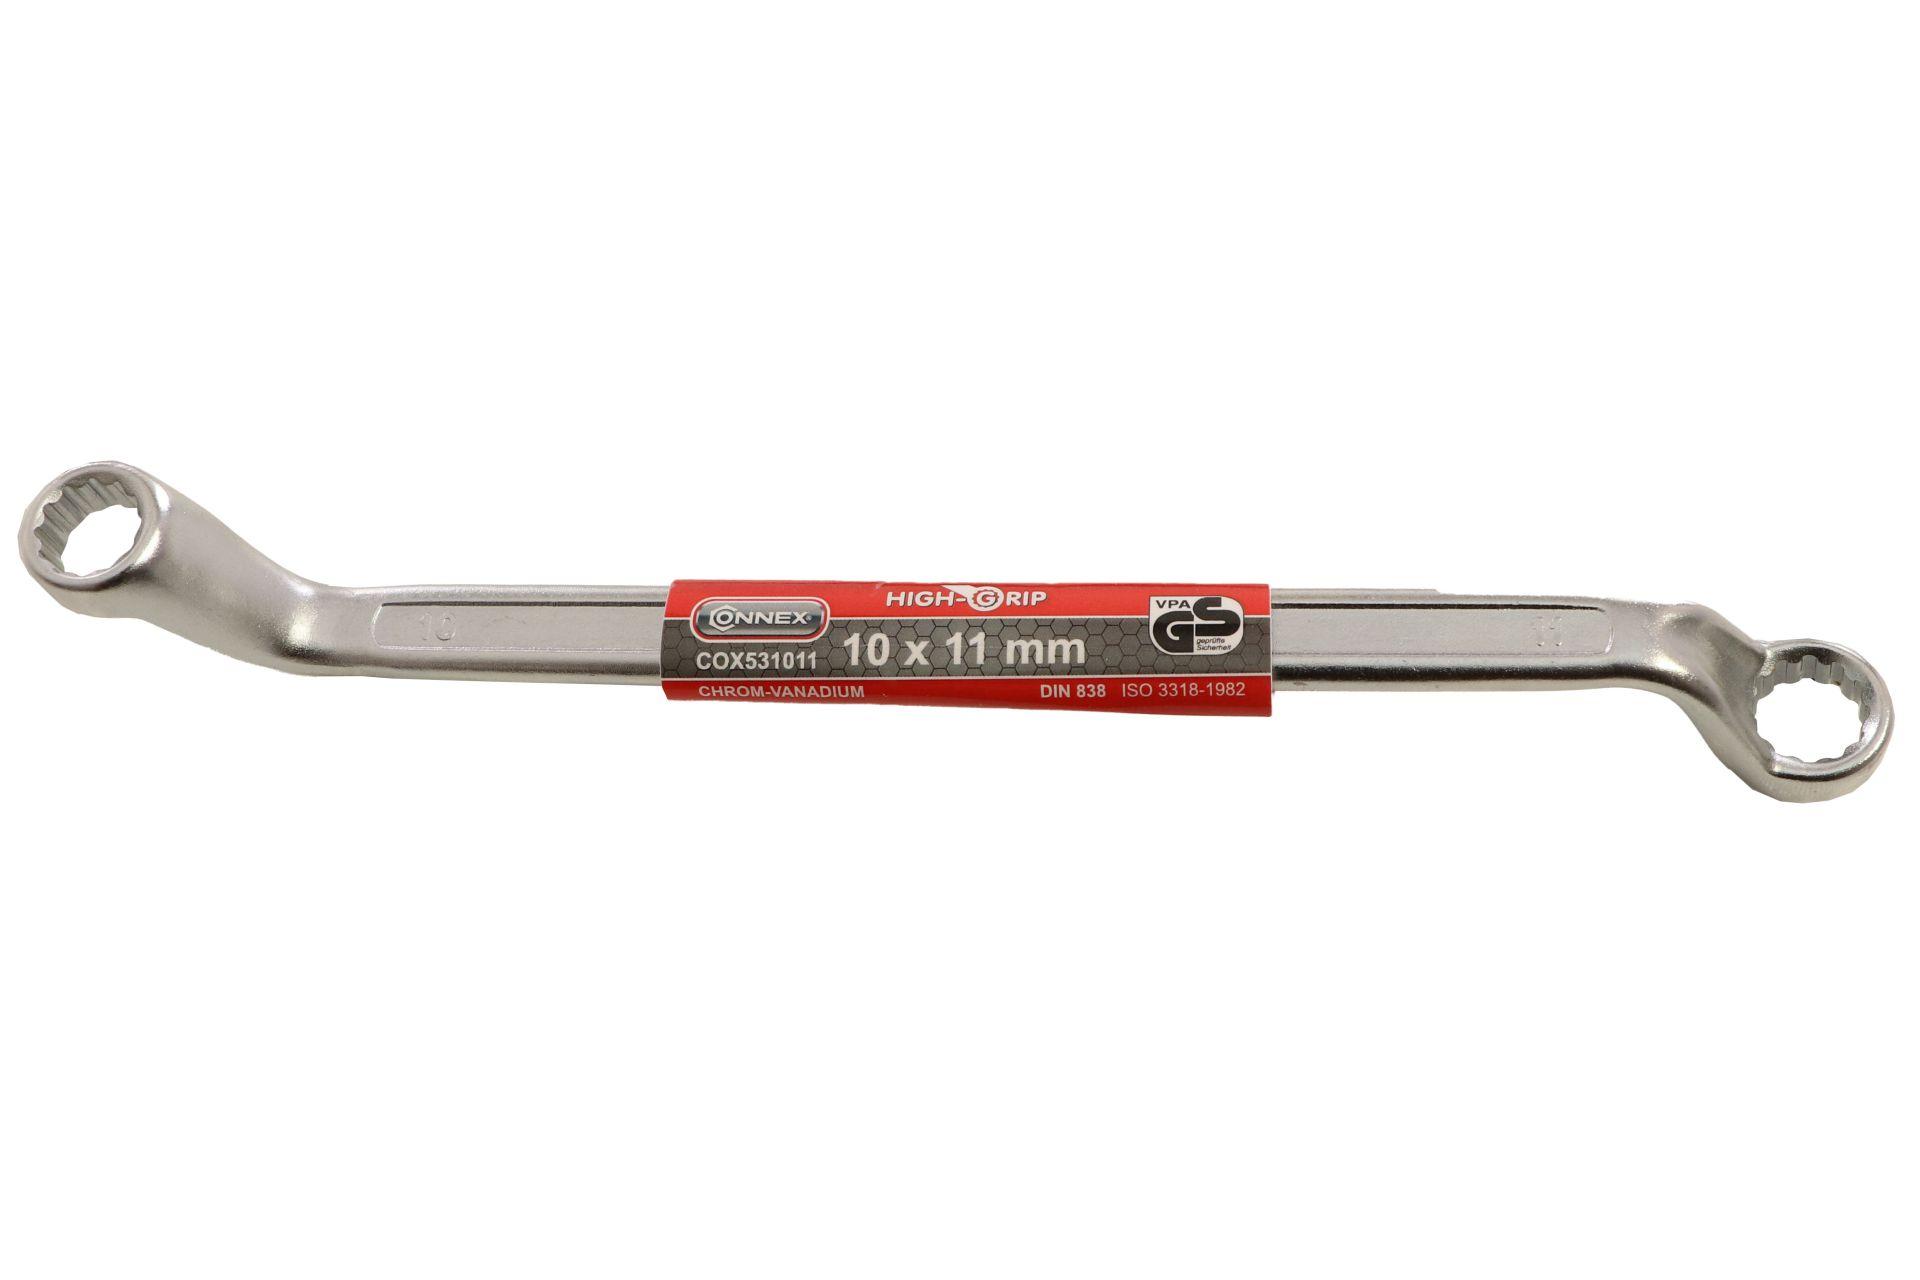 Conmetall Ringschlüssel, matt verchromt, 10 x 11 mm